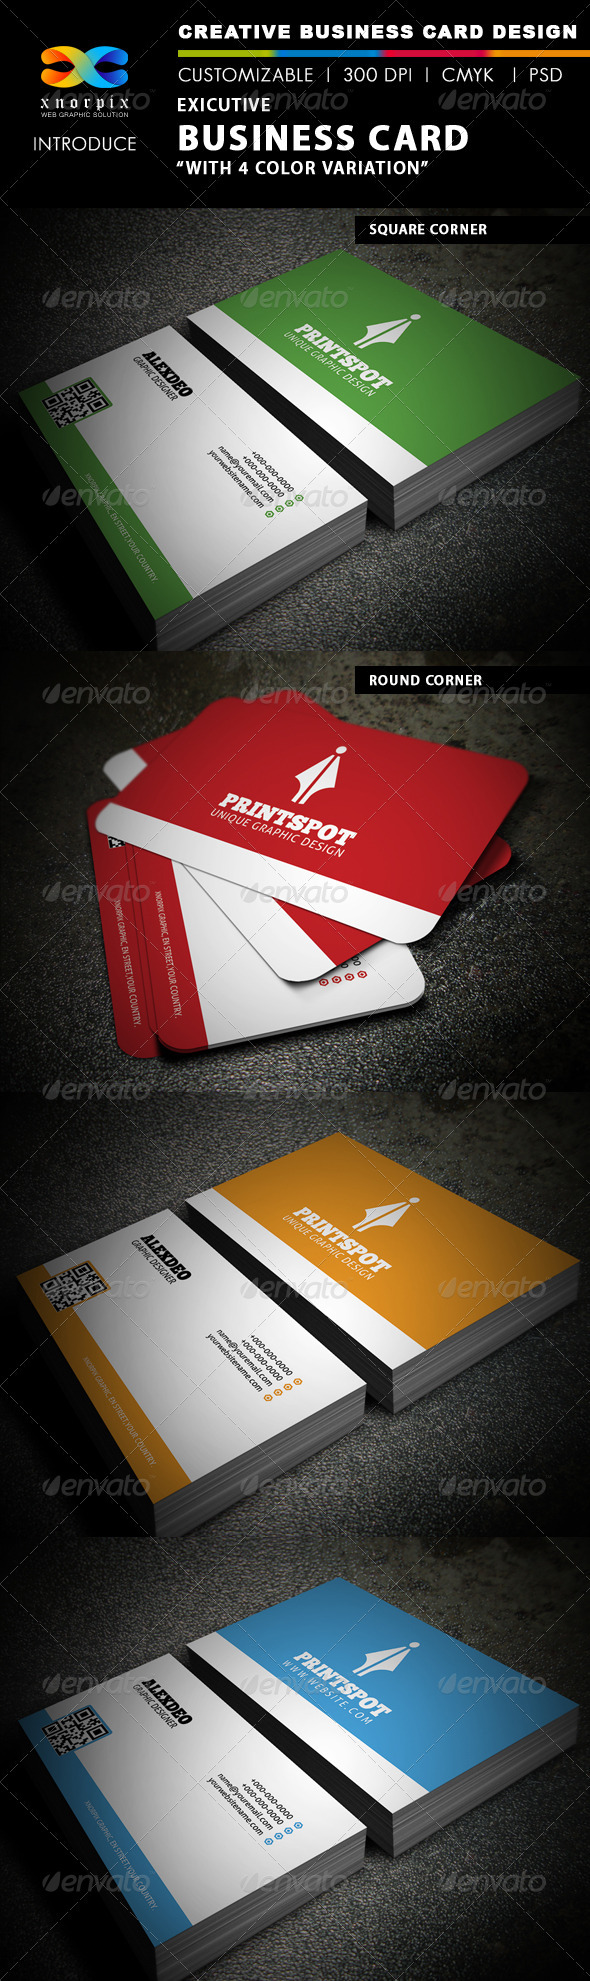 Executive Business Card - Creative Business Cards